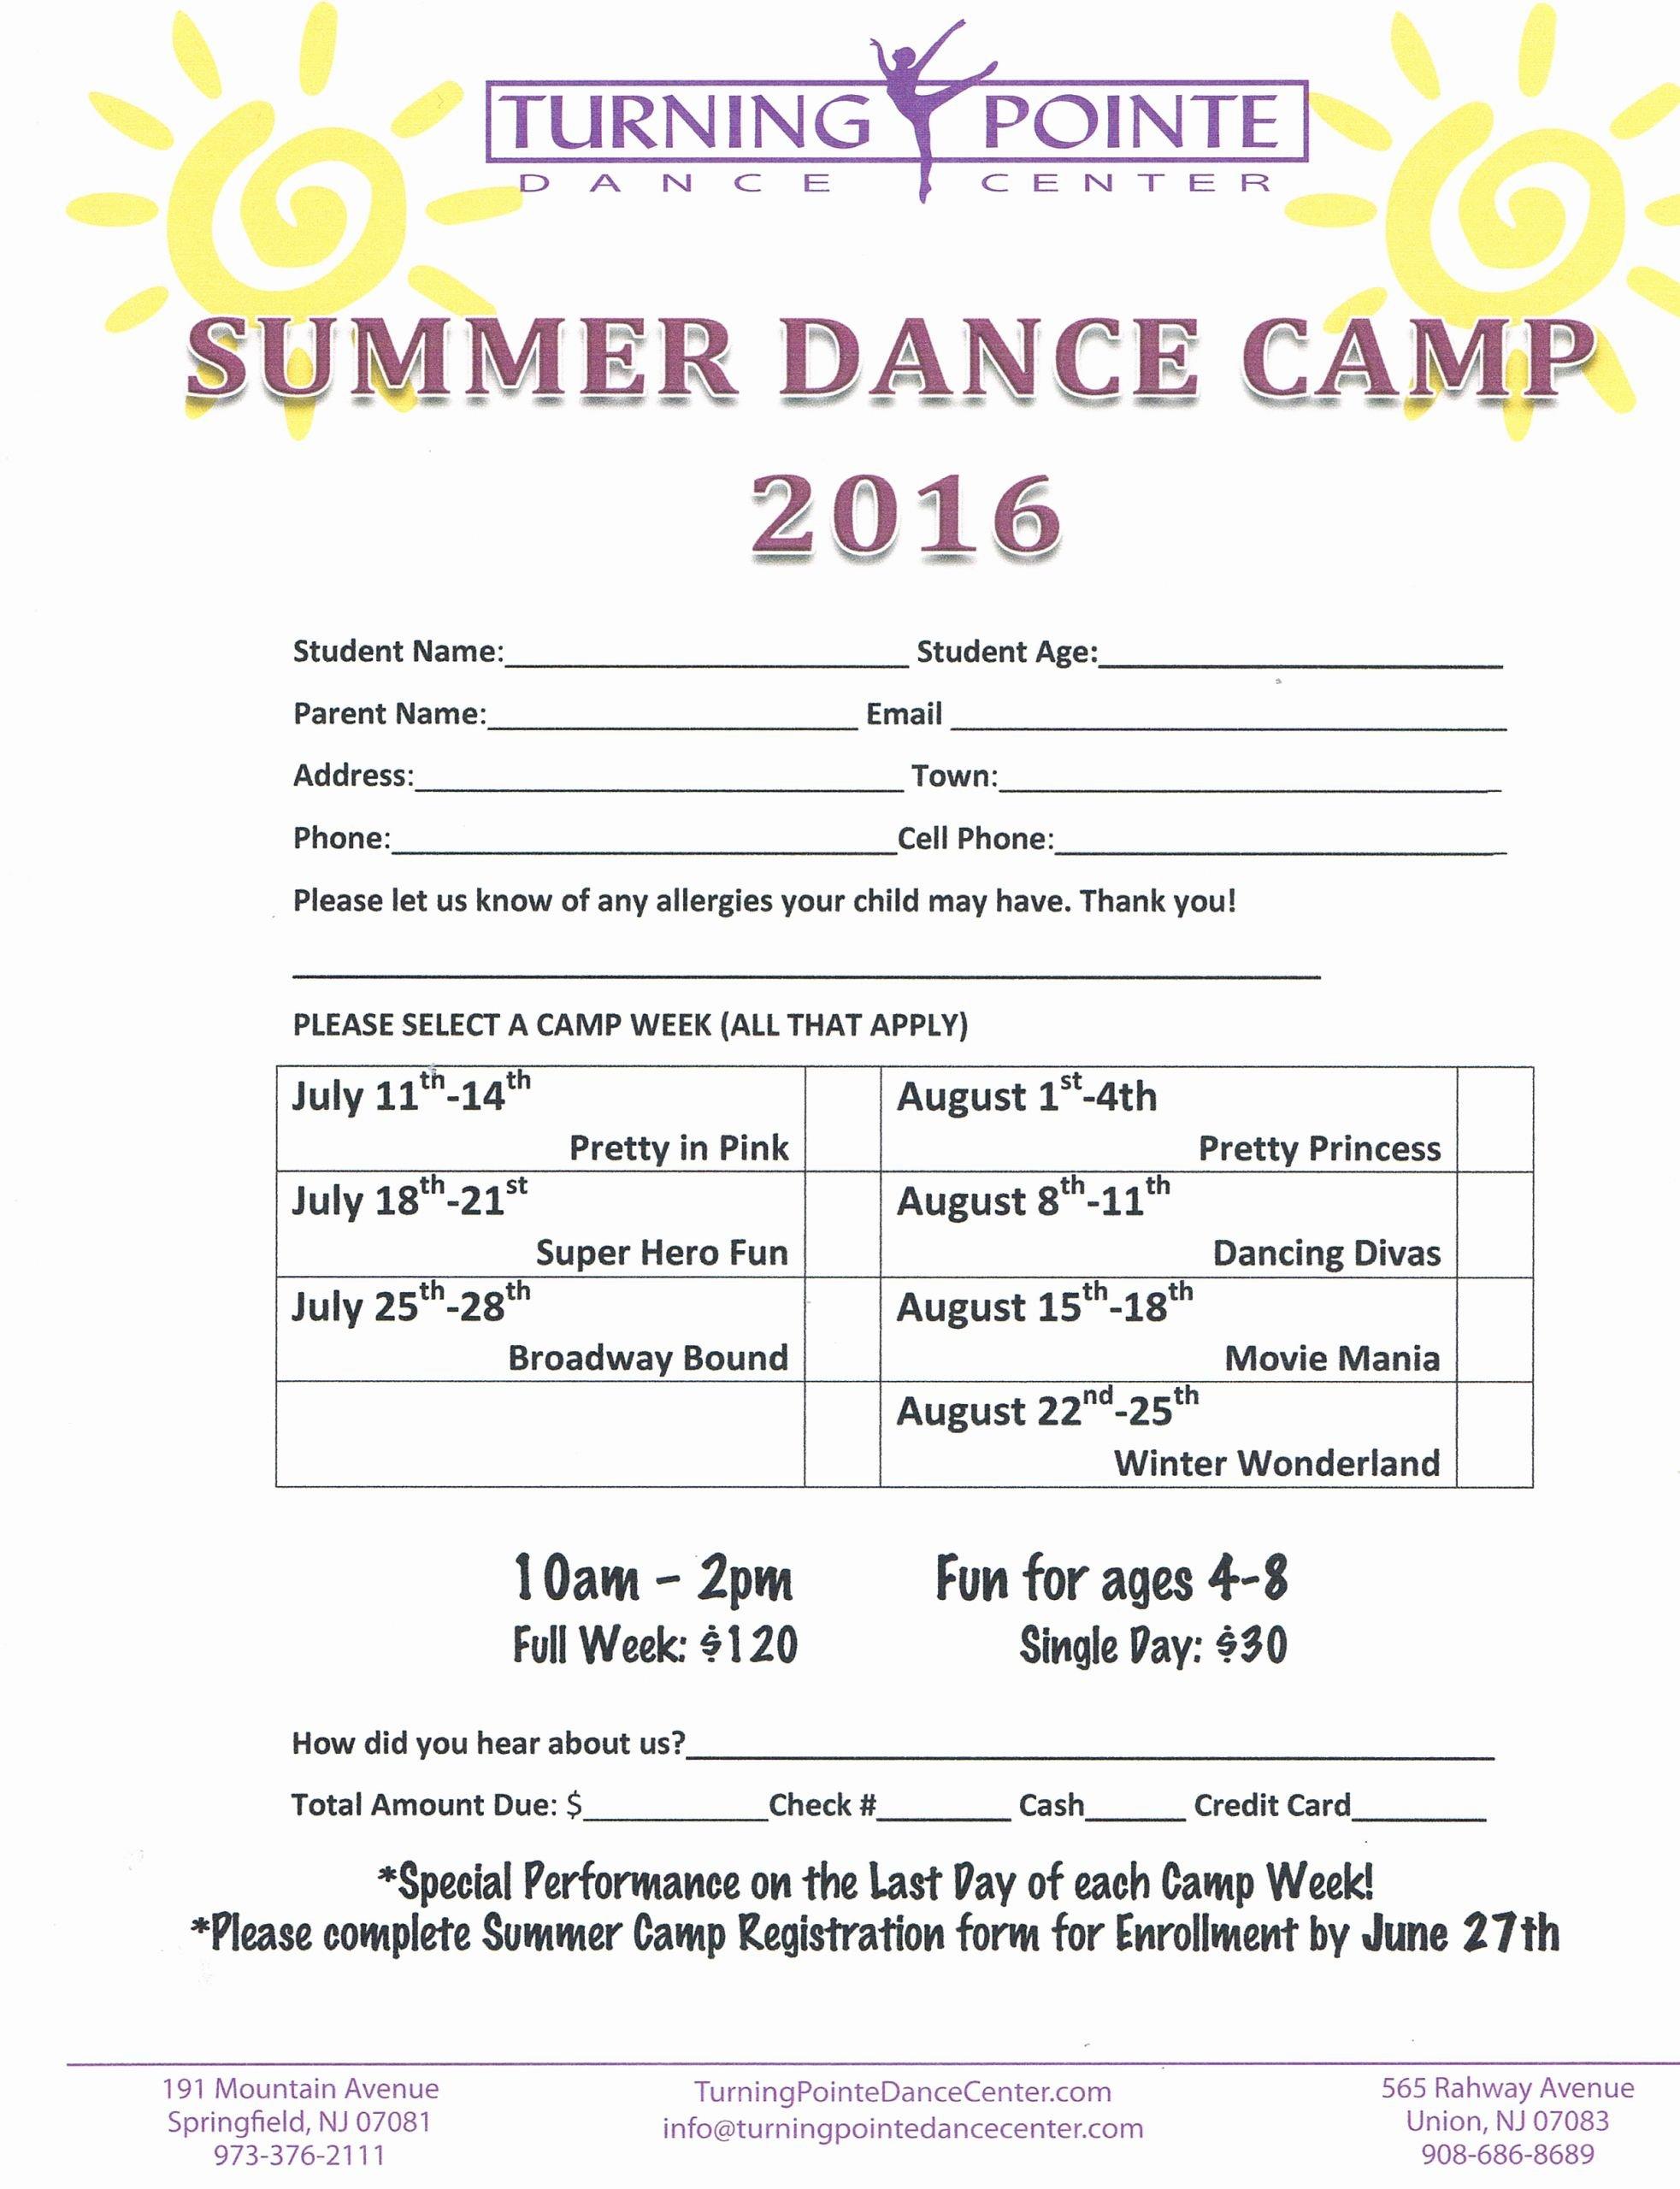 Summer Camp Registration form Template Unique Summer Schedule Turning Pointe Dance Center